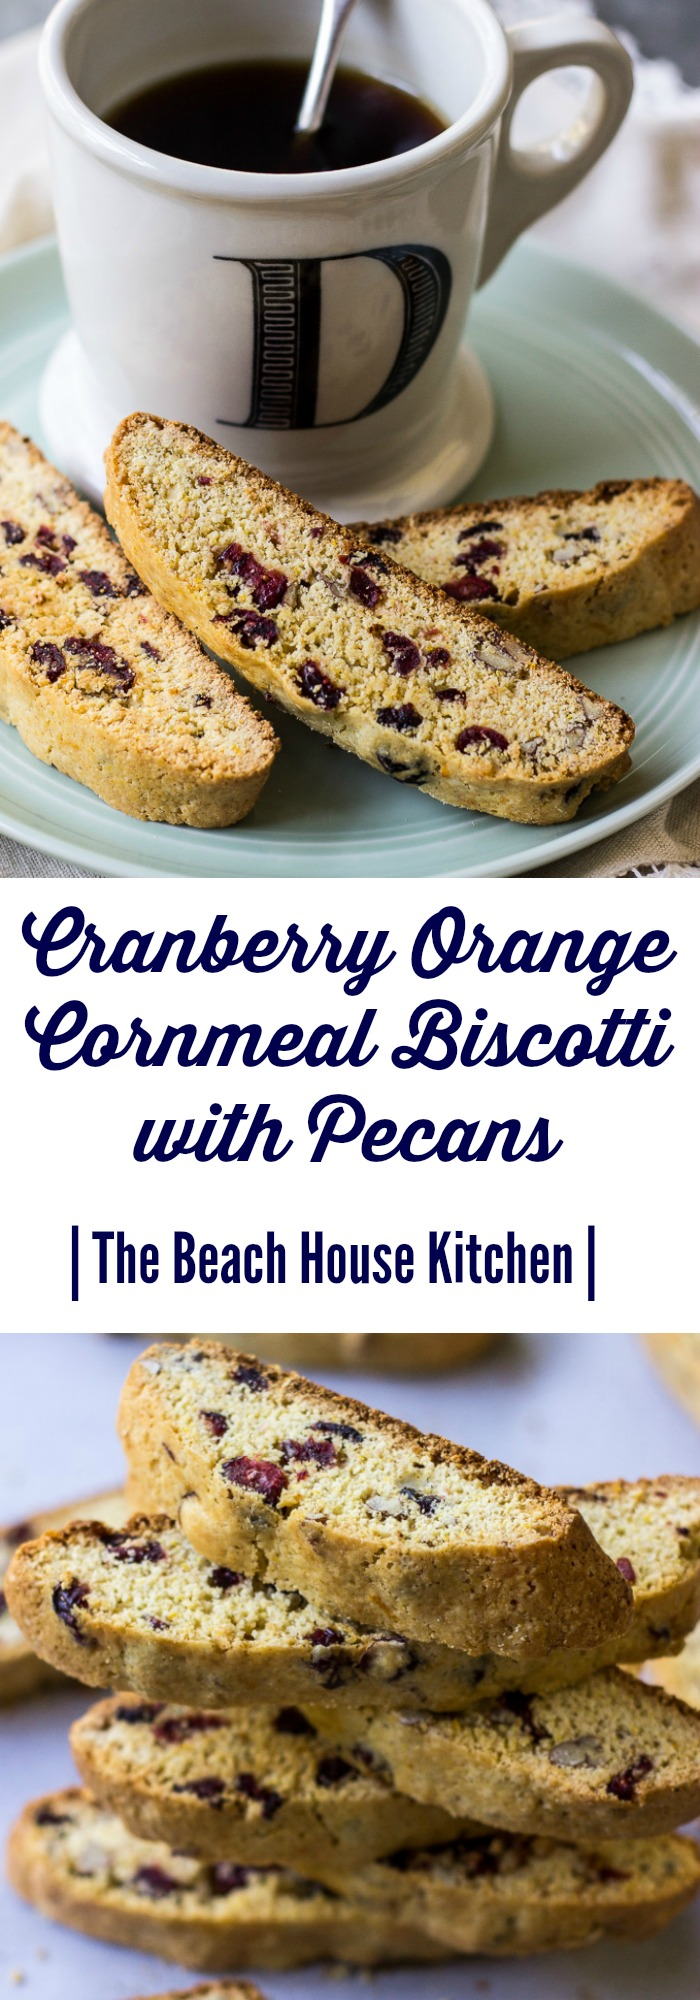 Cranberry Orange Cornmeal Biscotti with Pecans